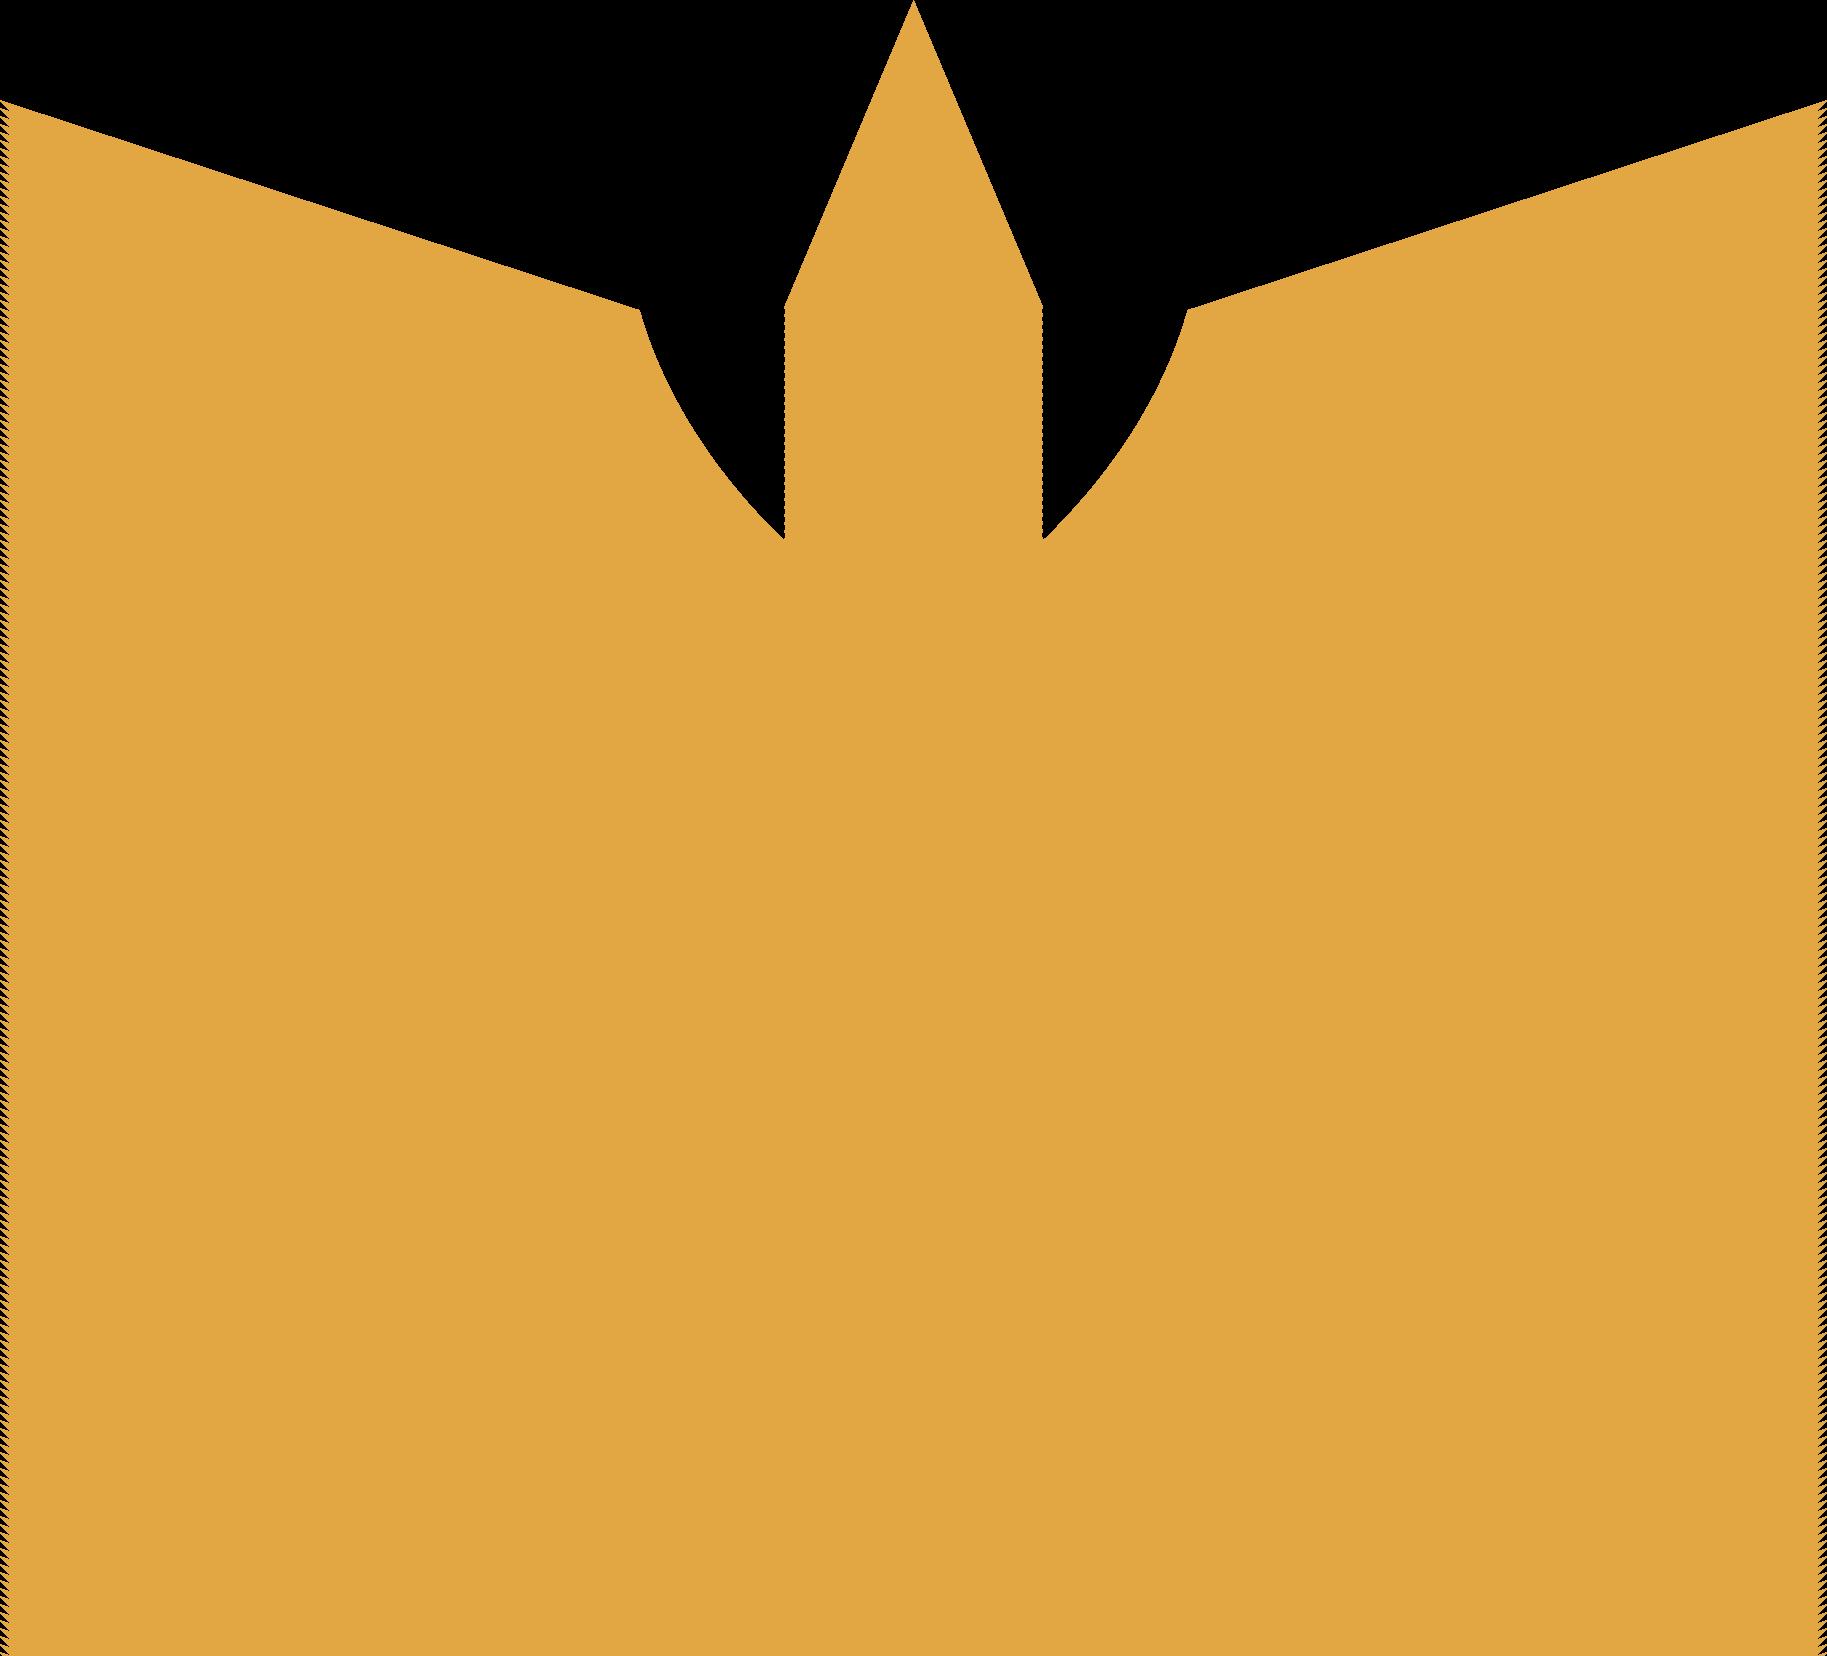 neo zeon uc0096 by disastranagant emblem pinterest gundam and rh pinterest com celestial being logo hd celestial being logo hd